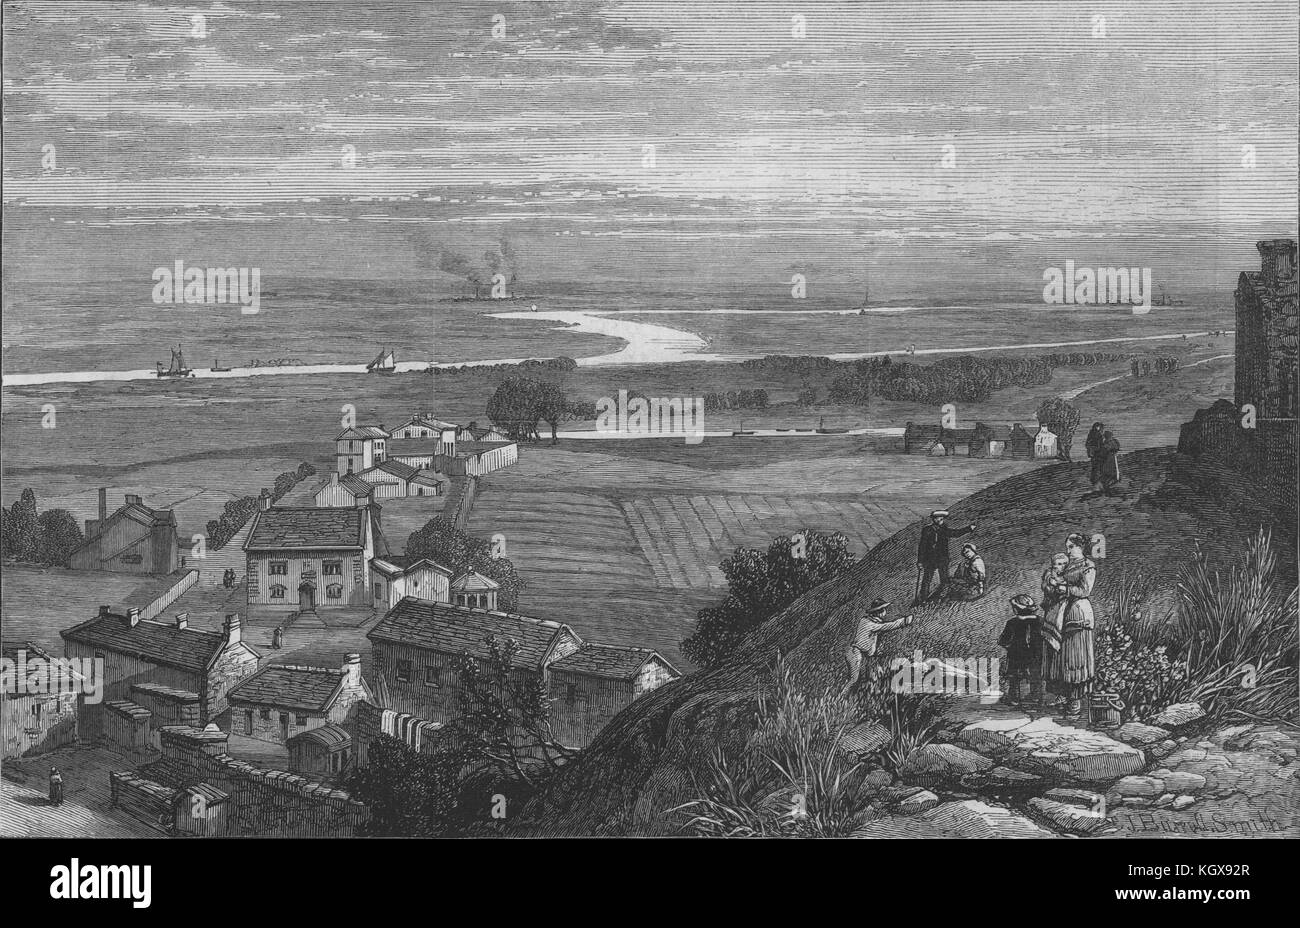 Mersey Warrington Runcorn Duke Of Bridgewater's canal Halton Cheshire 1883. The Illustrated London News Stock Photo